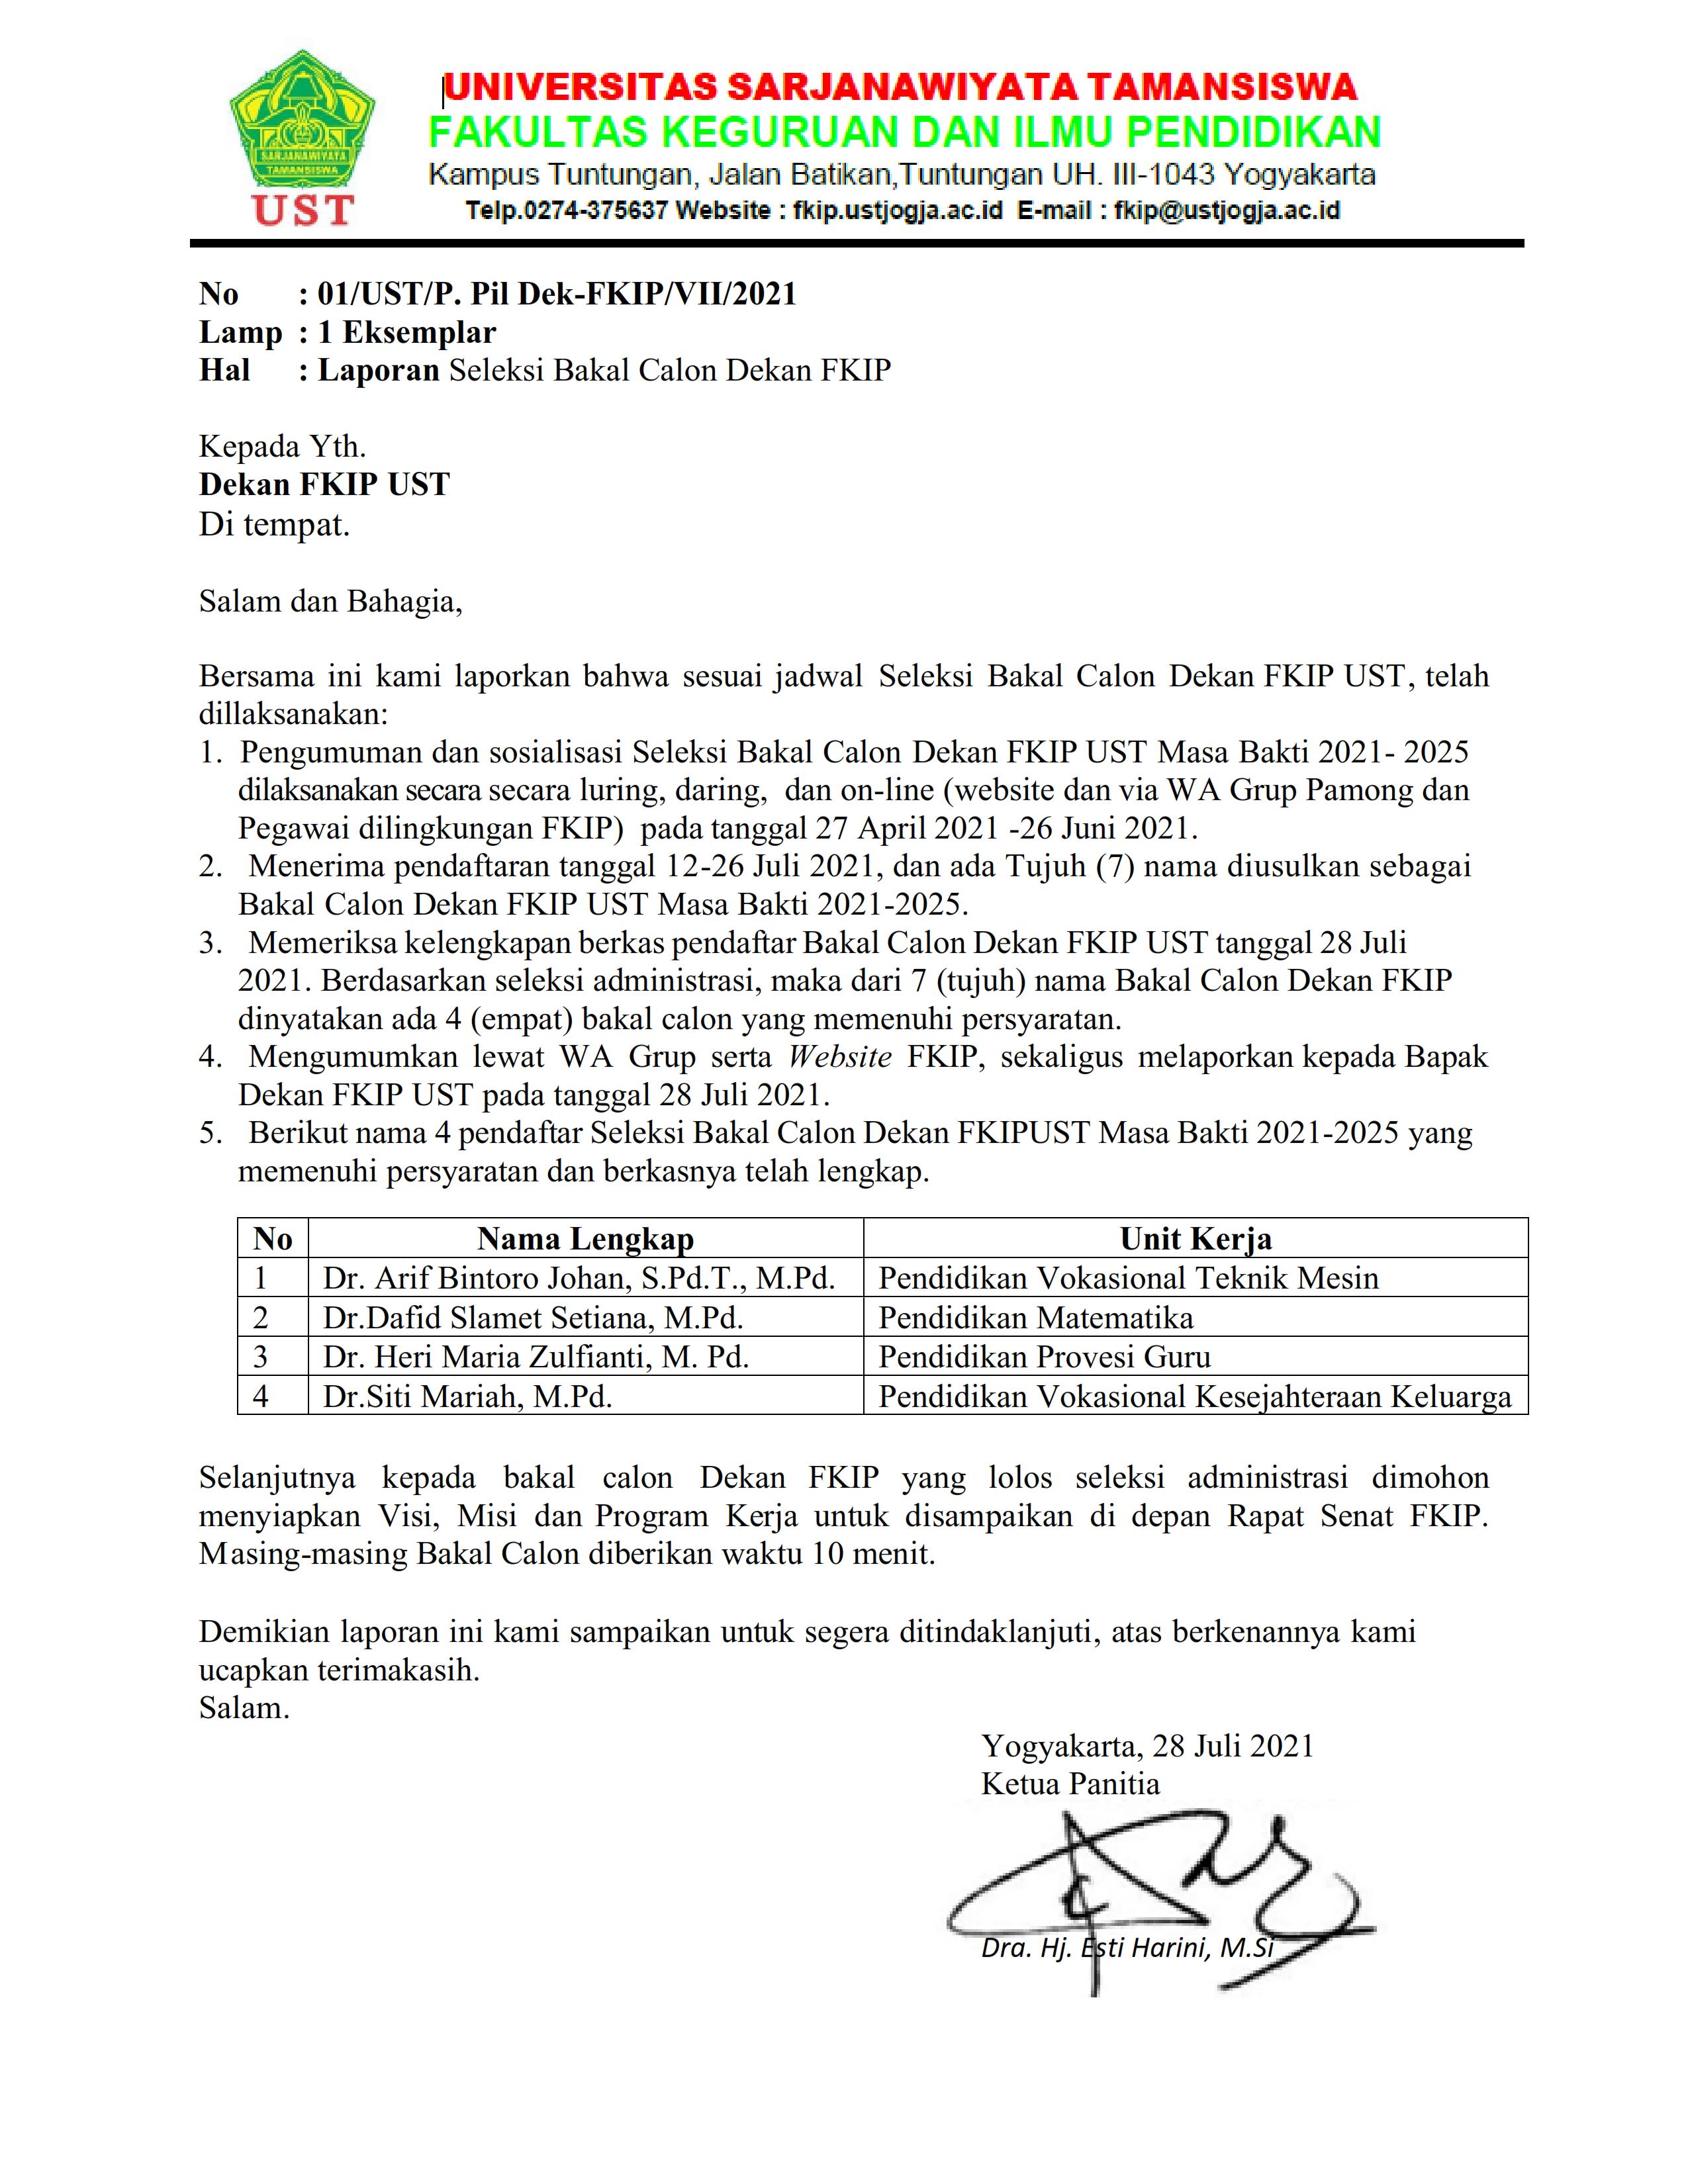 Laporan Seleksi Bakal Calon Dekan FKIP Periode 2021-2025